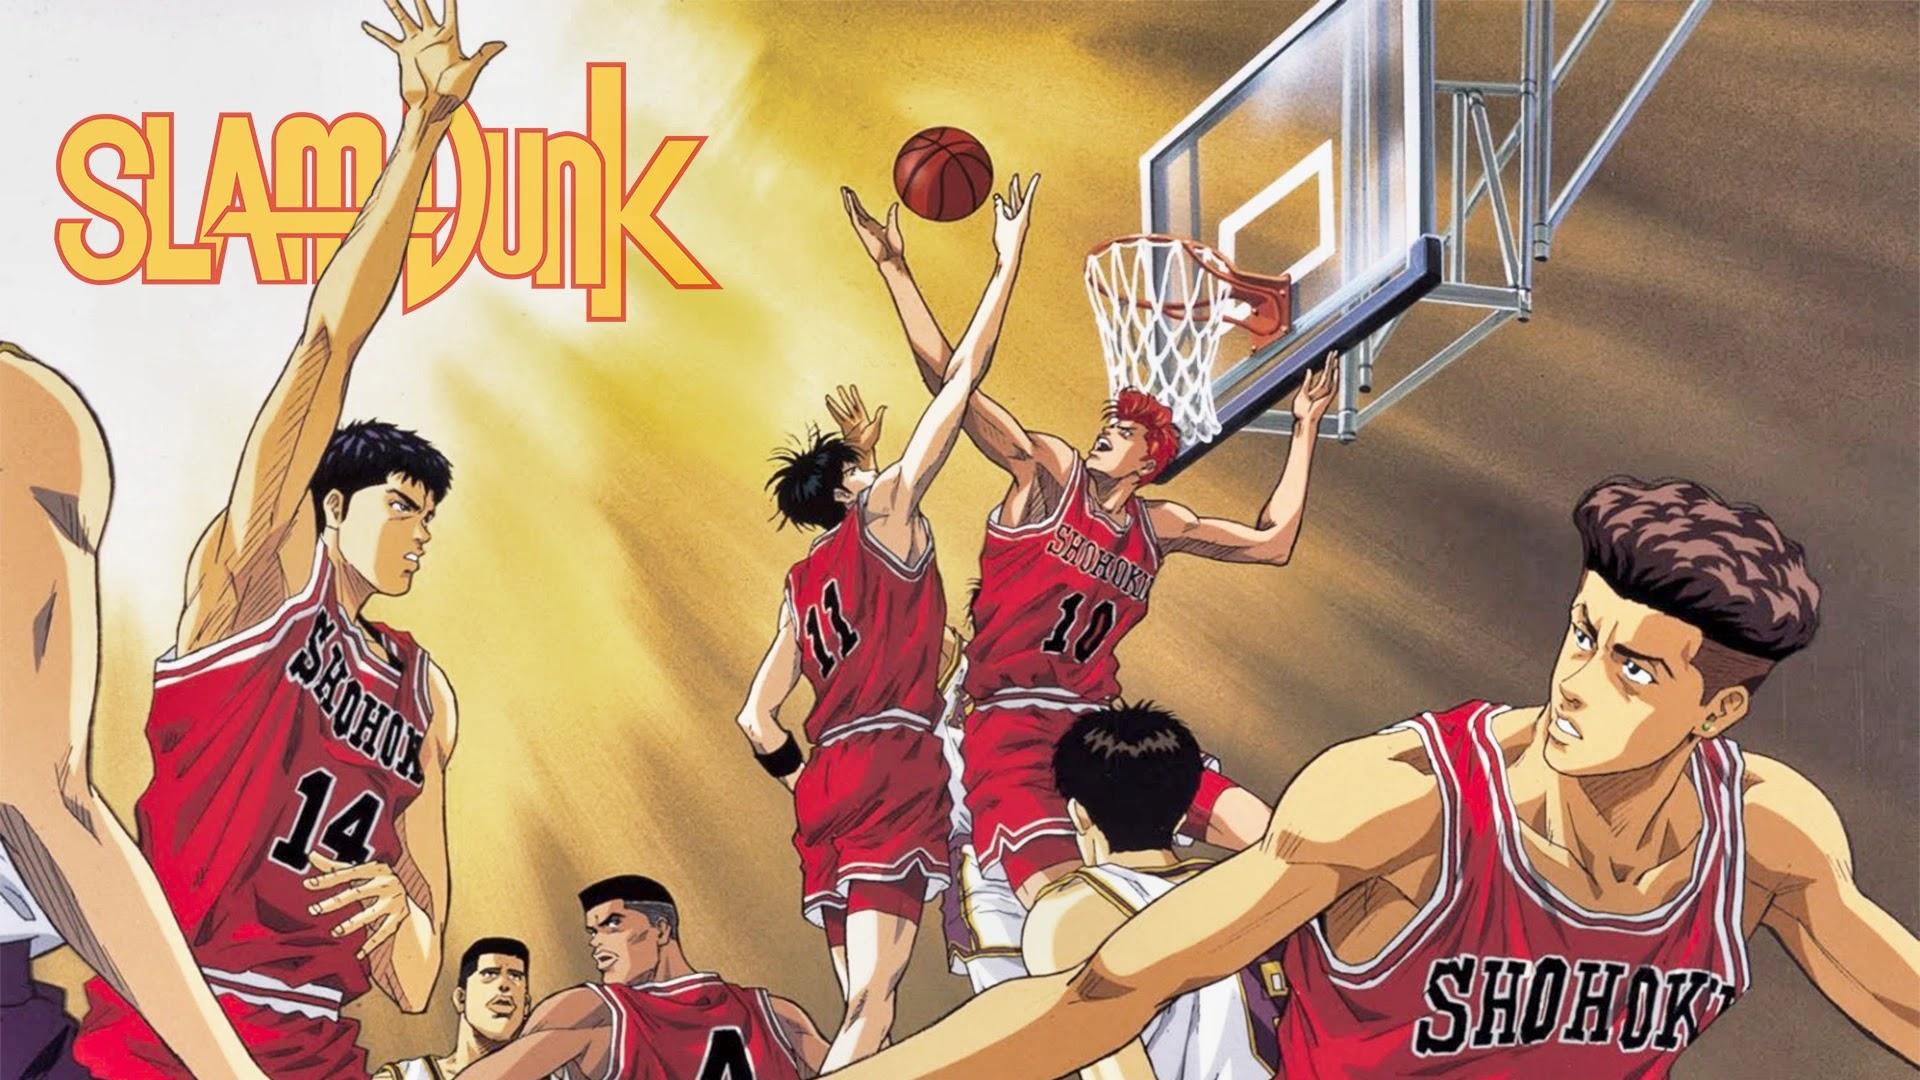 Slam Dunk Wallpaper